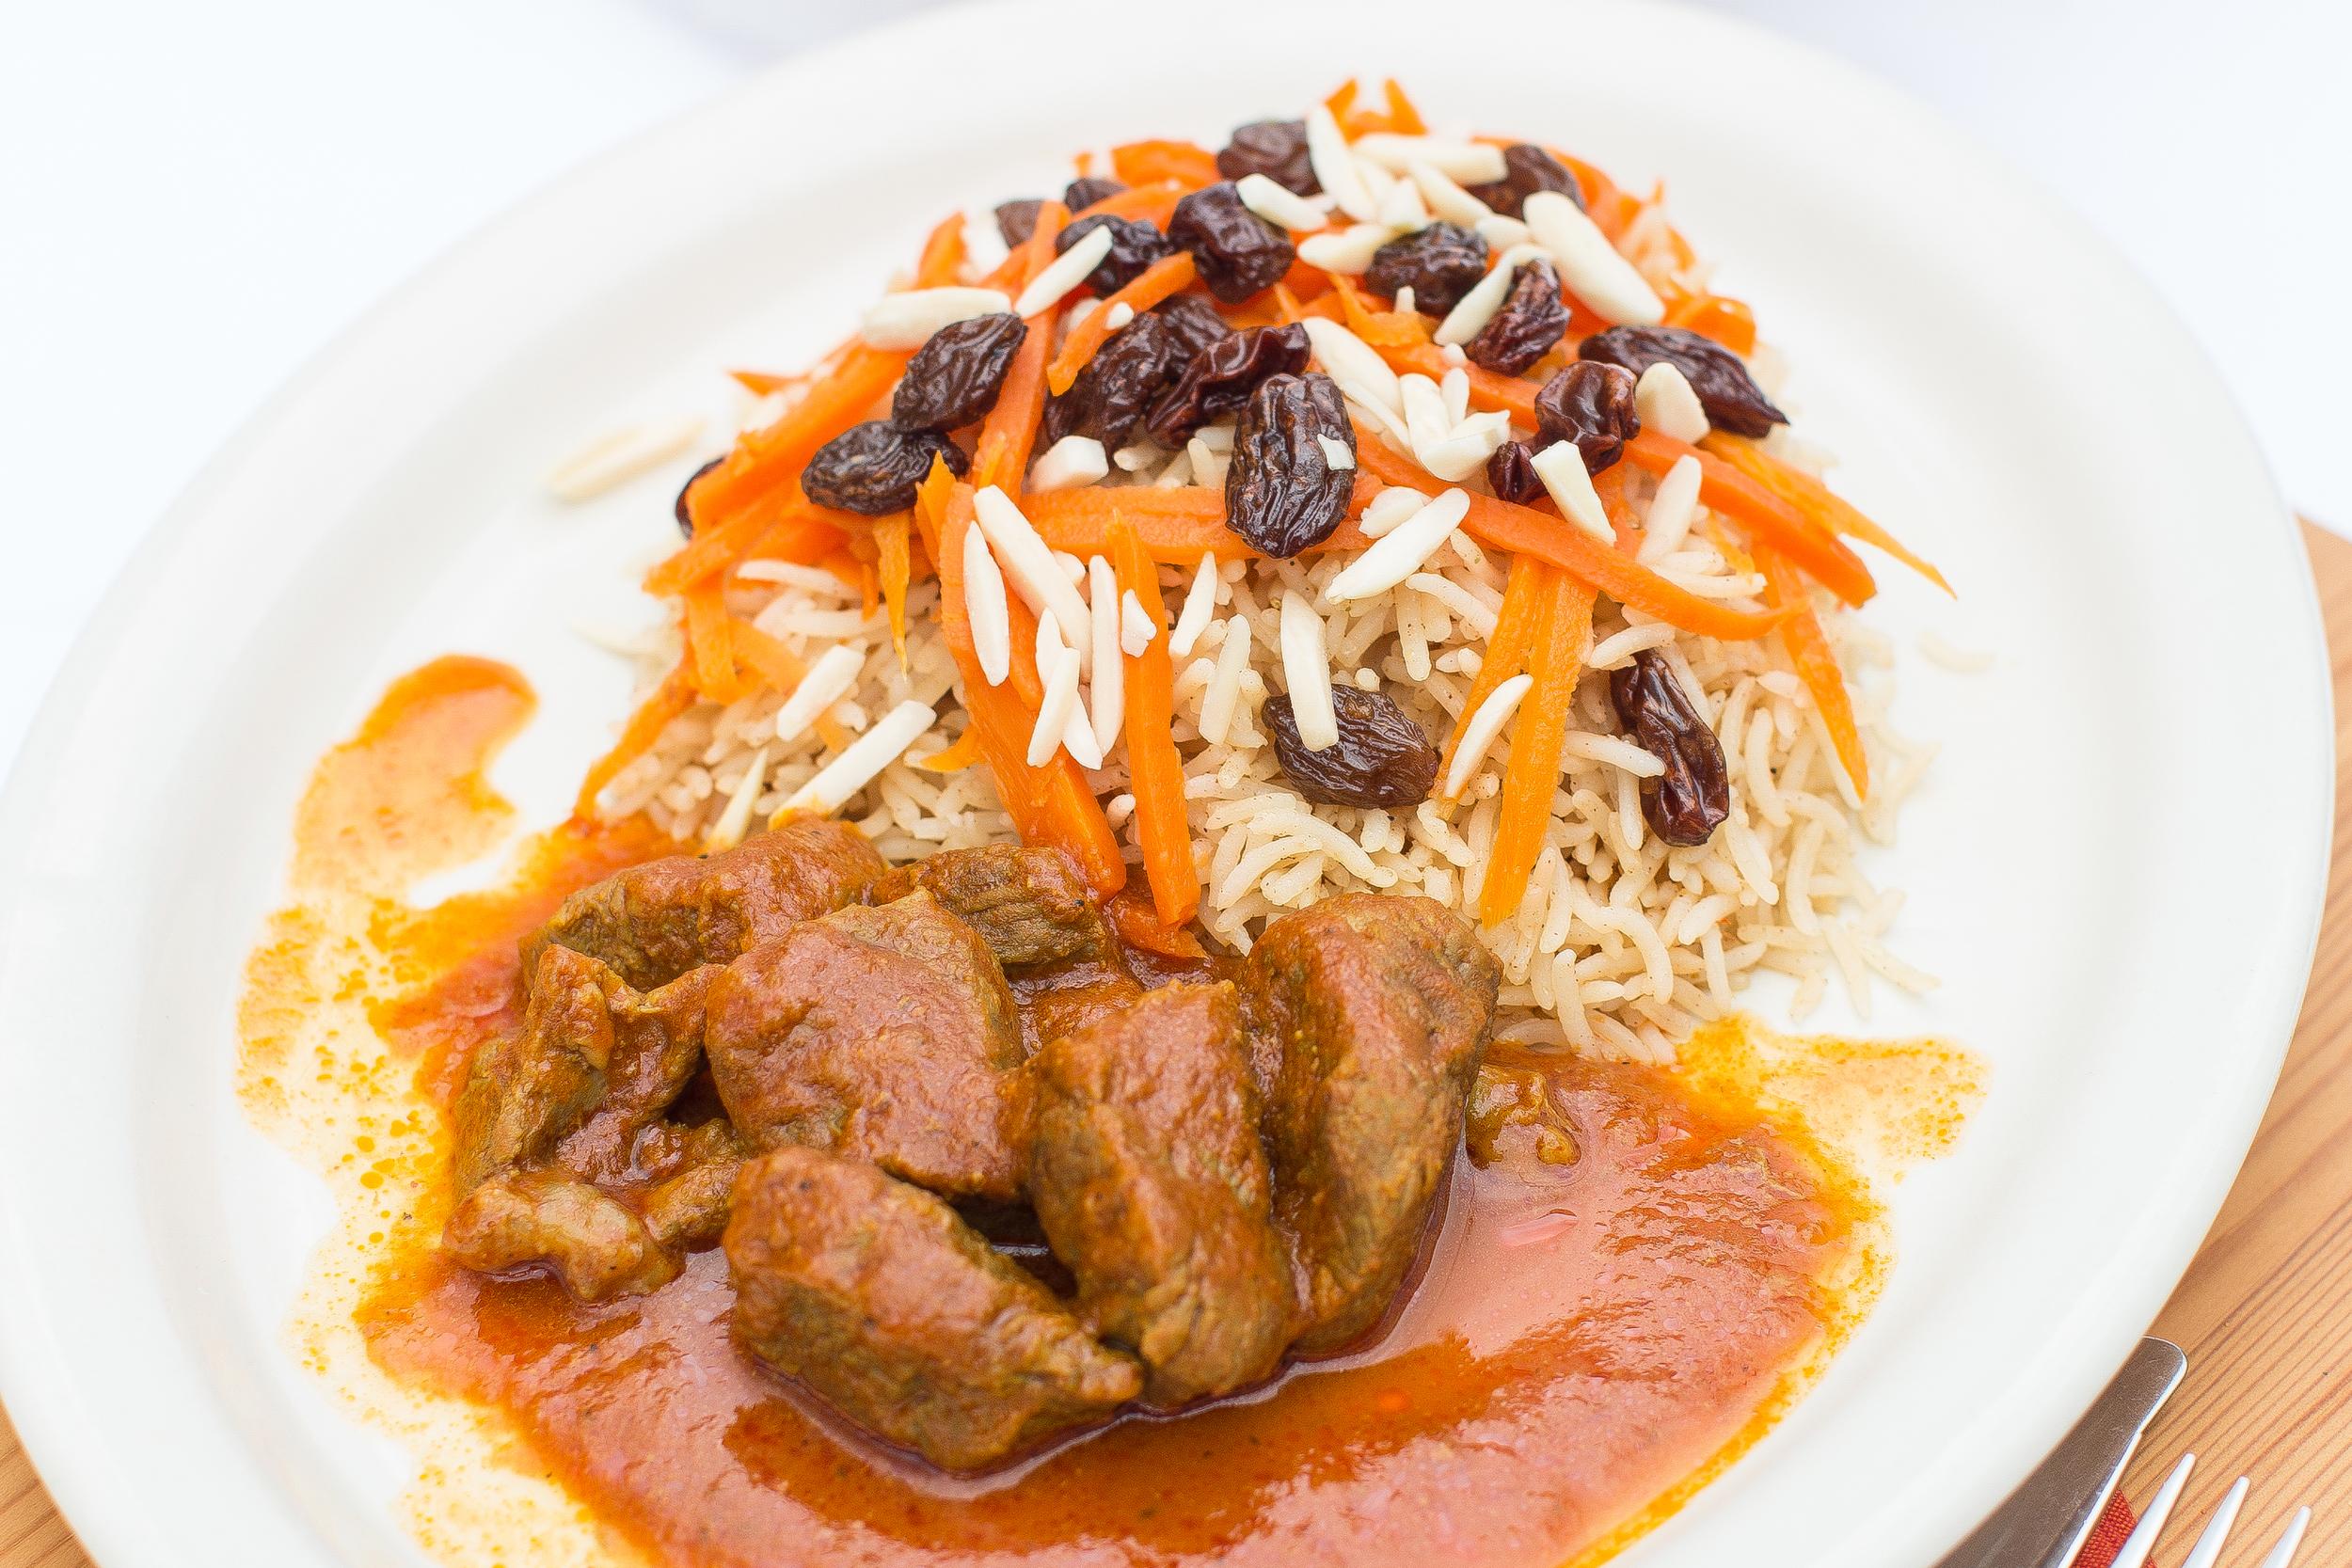 Panjshir-Cam-2-horizontal-5-nabu-food-photography.jpg